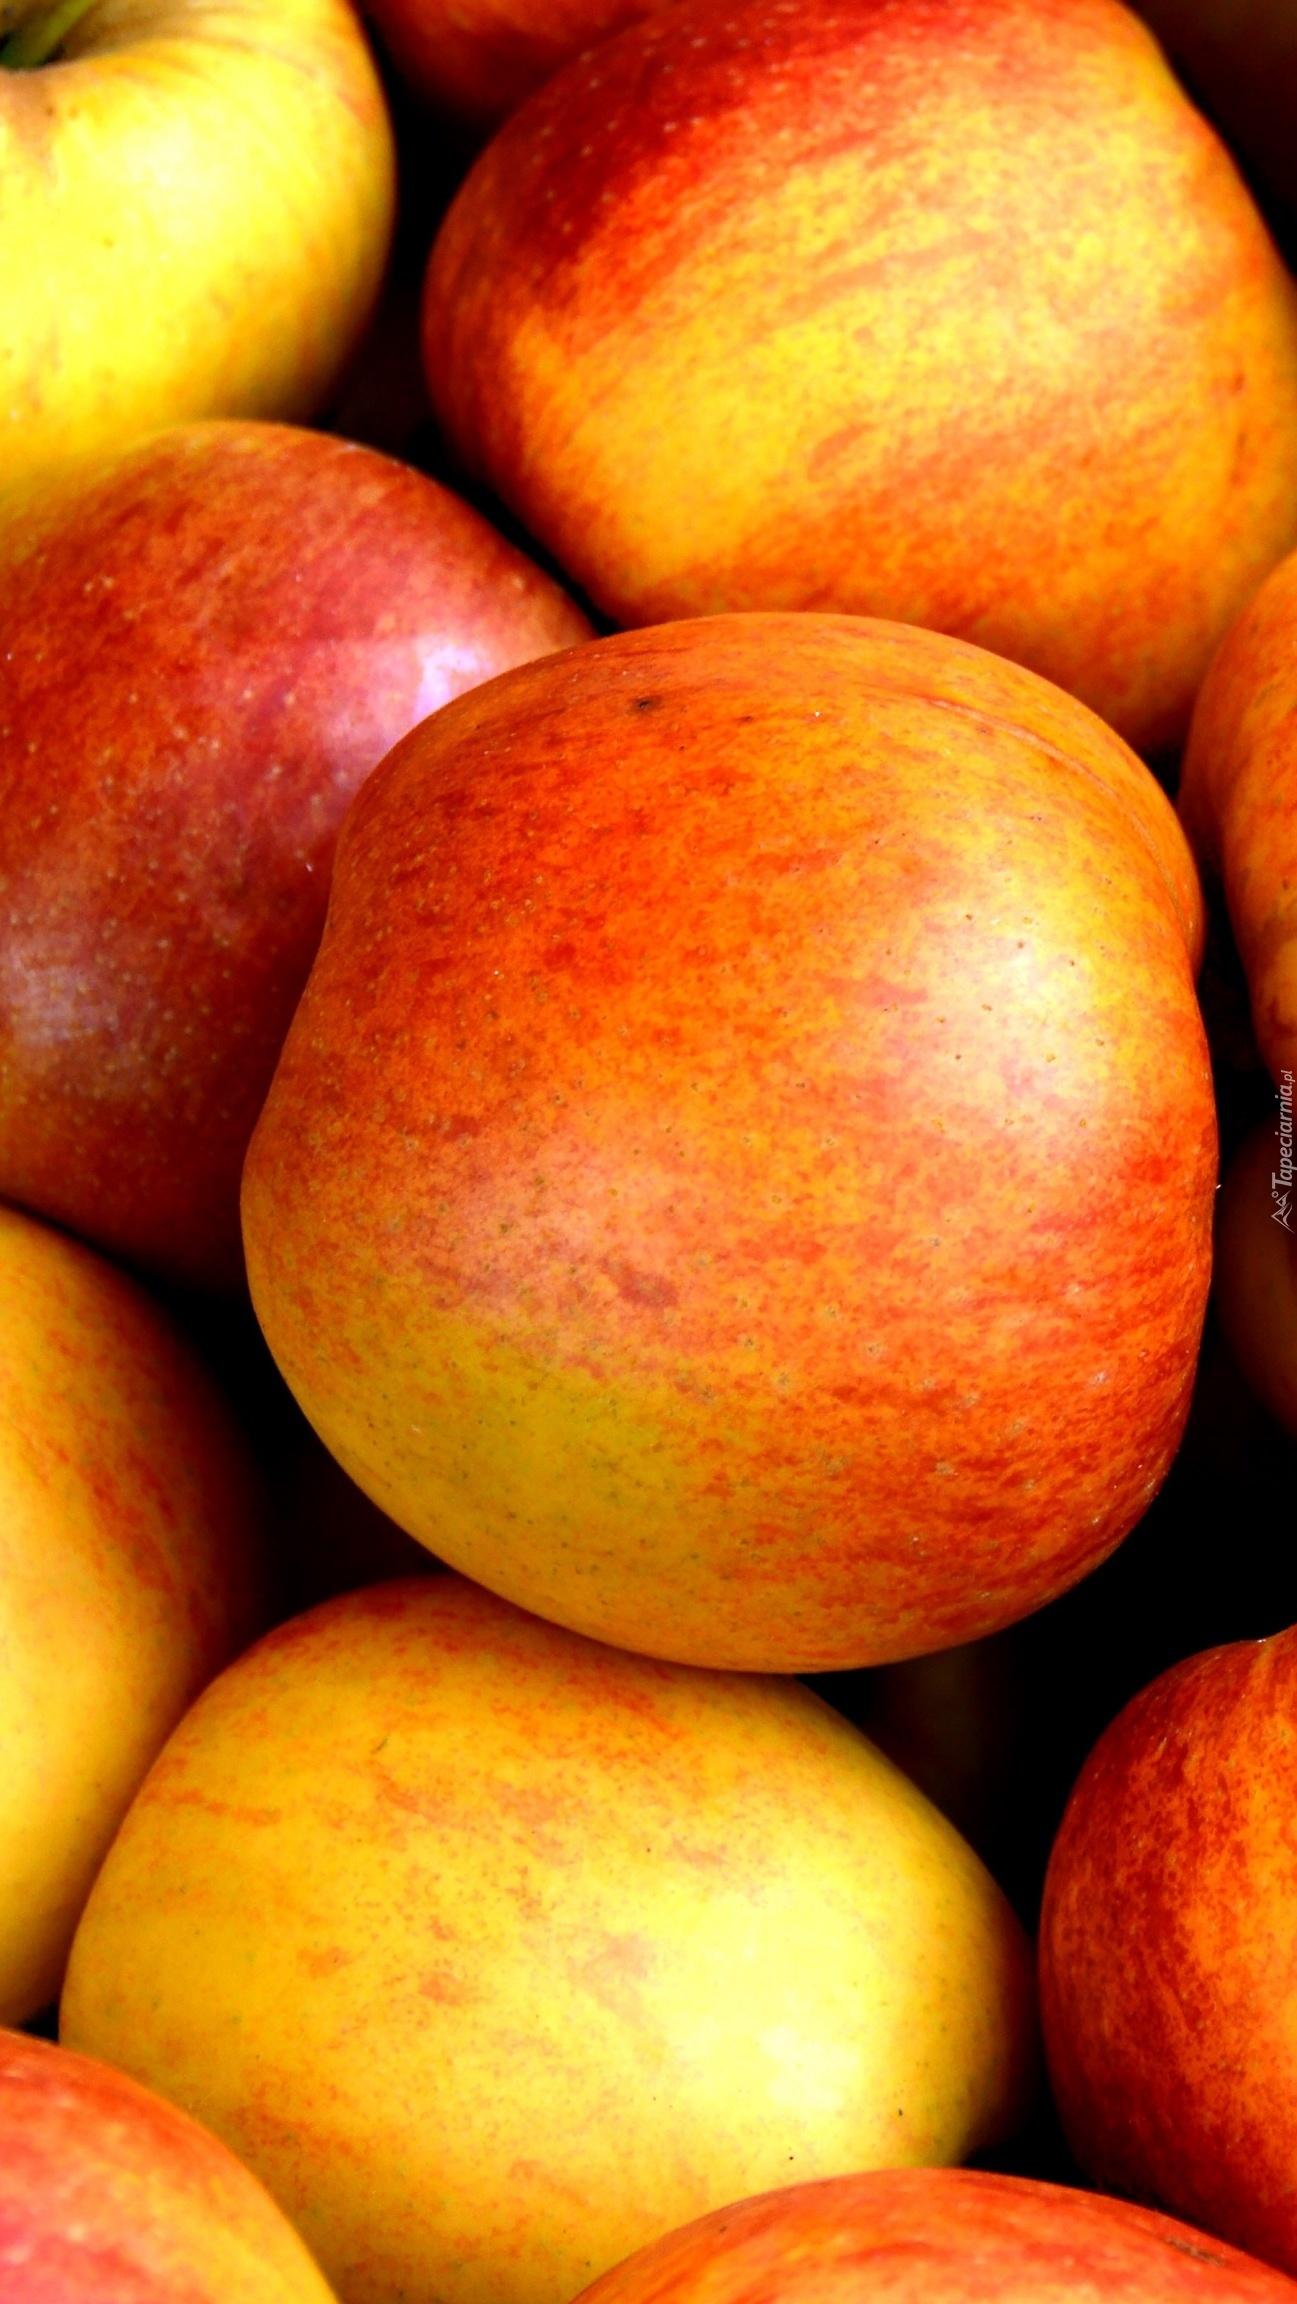 Dorodne jabłka